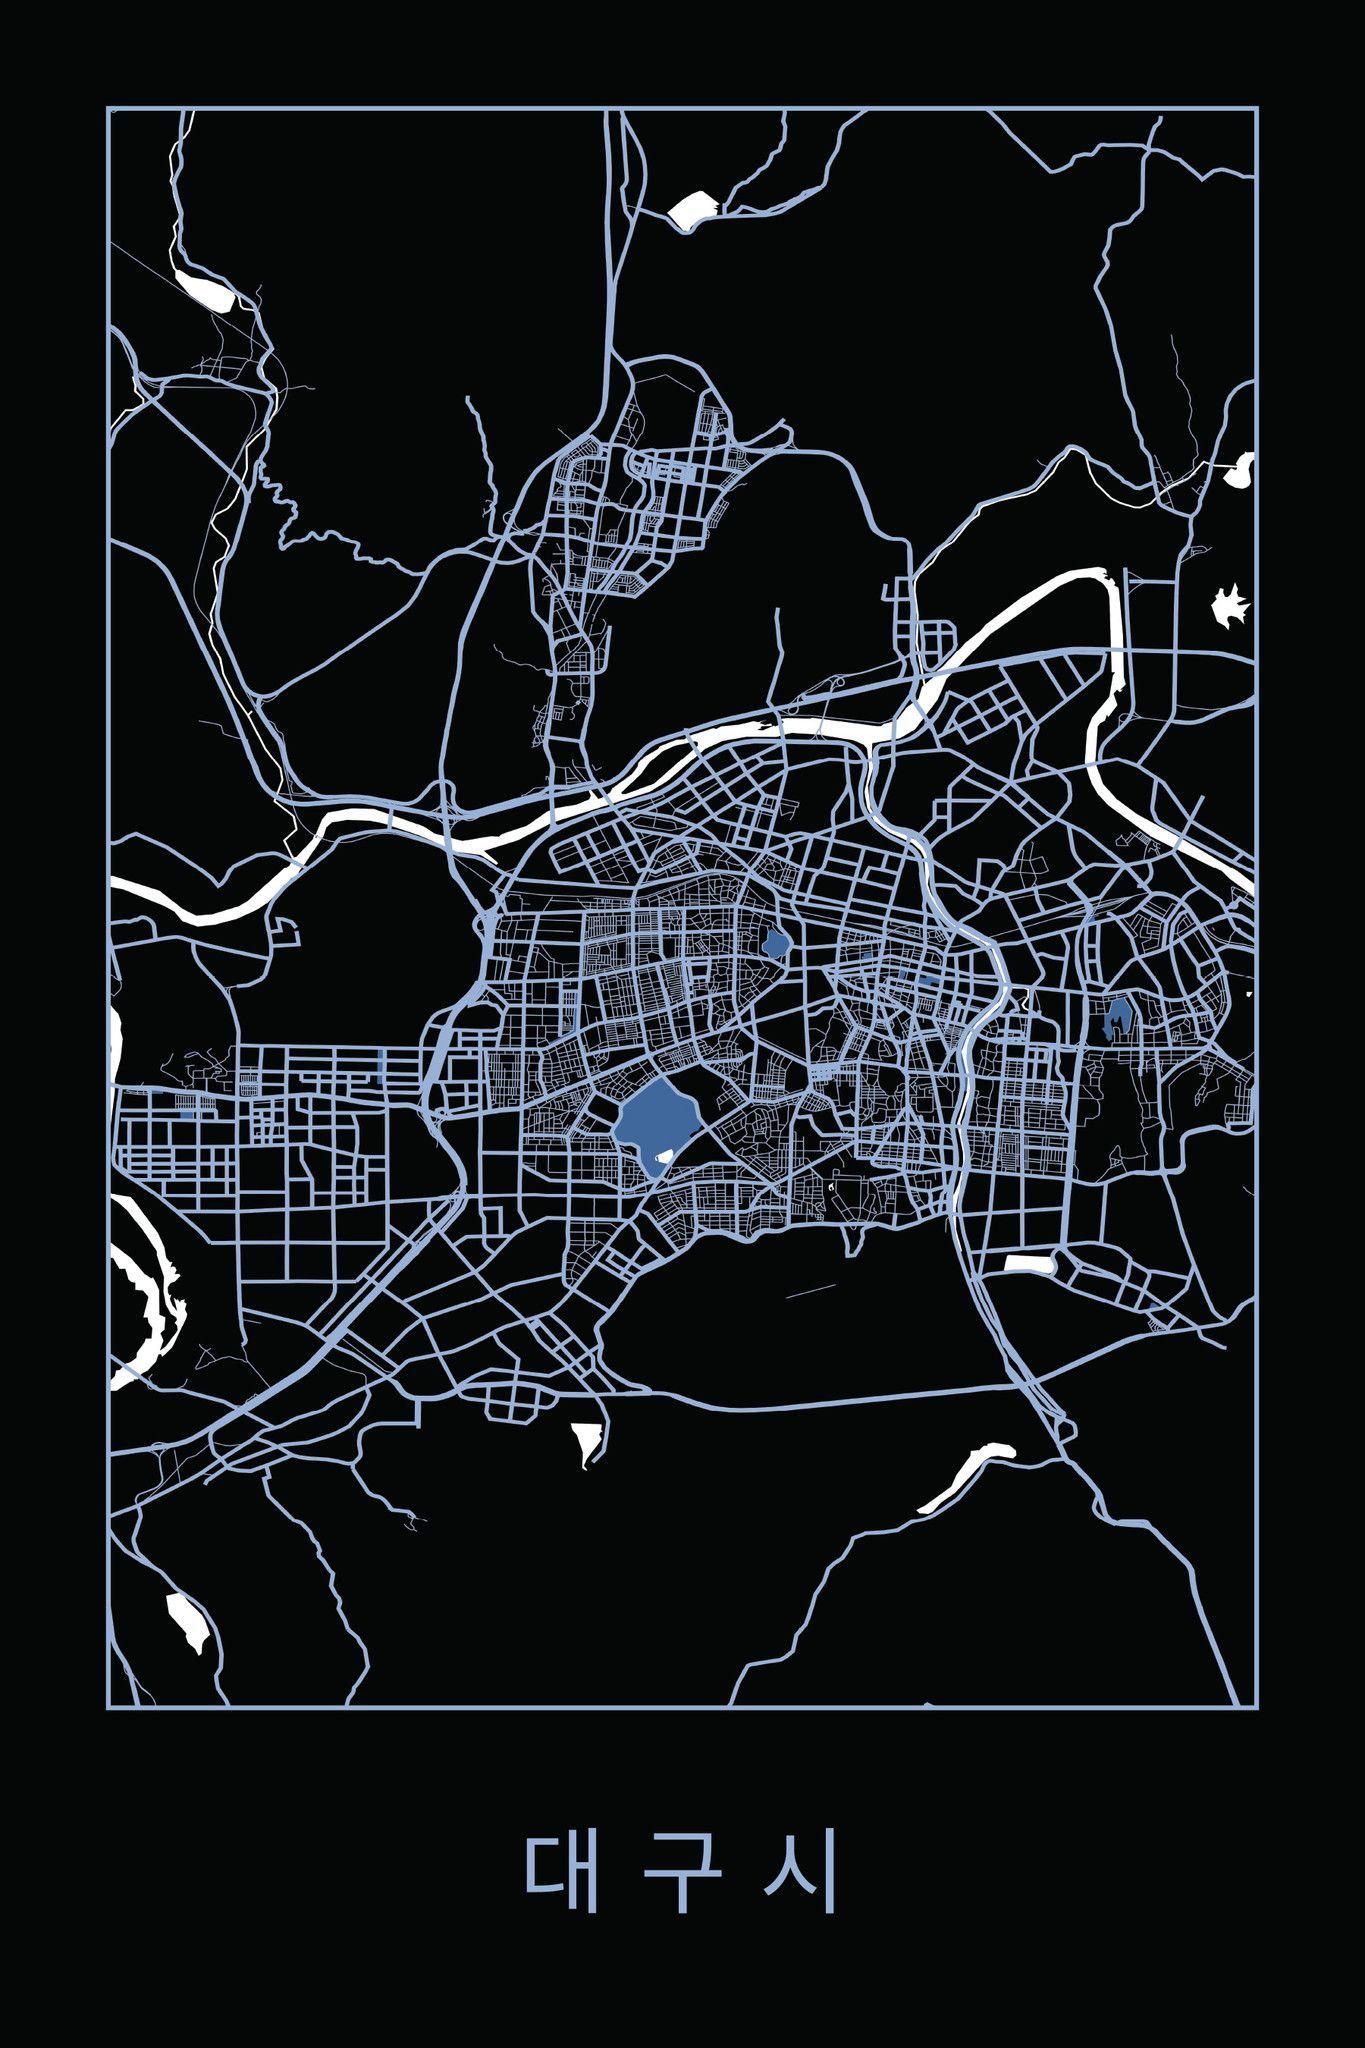 Daegu, South Korea by raenordic.com #map #southkorea #daegu